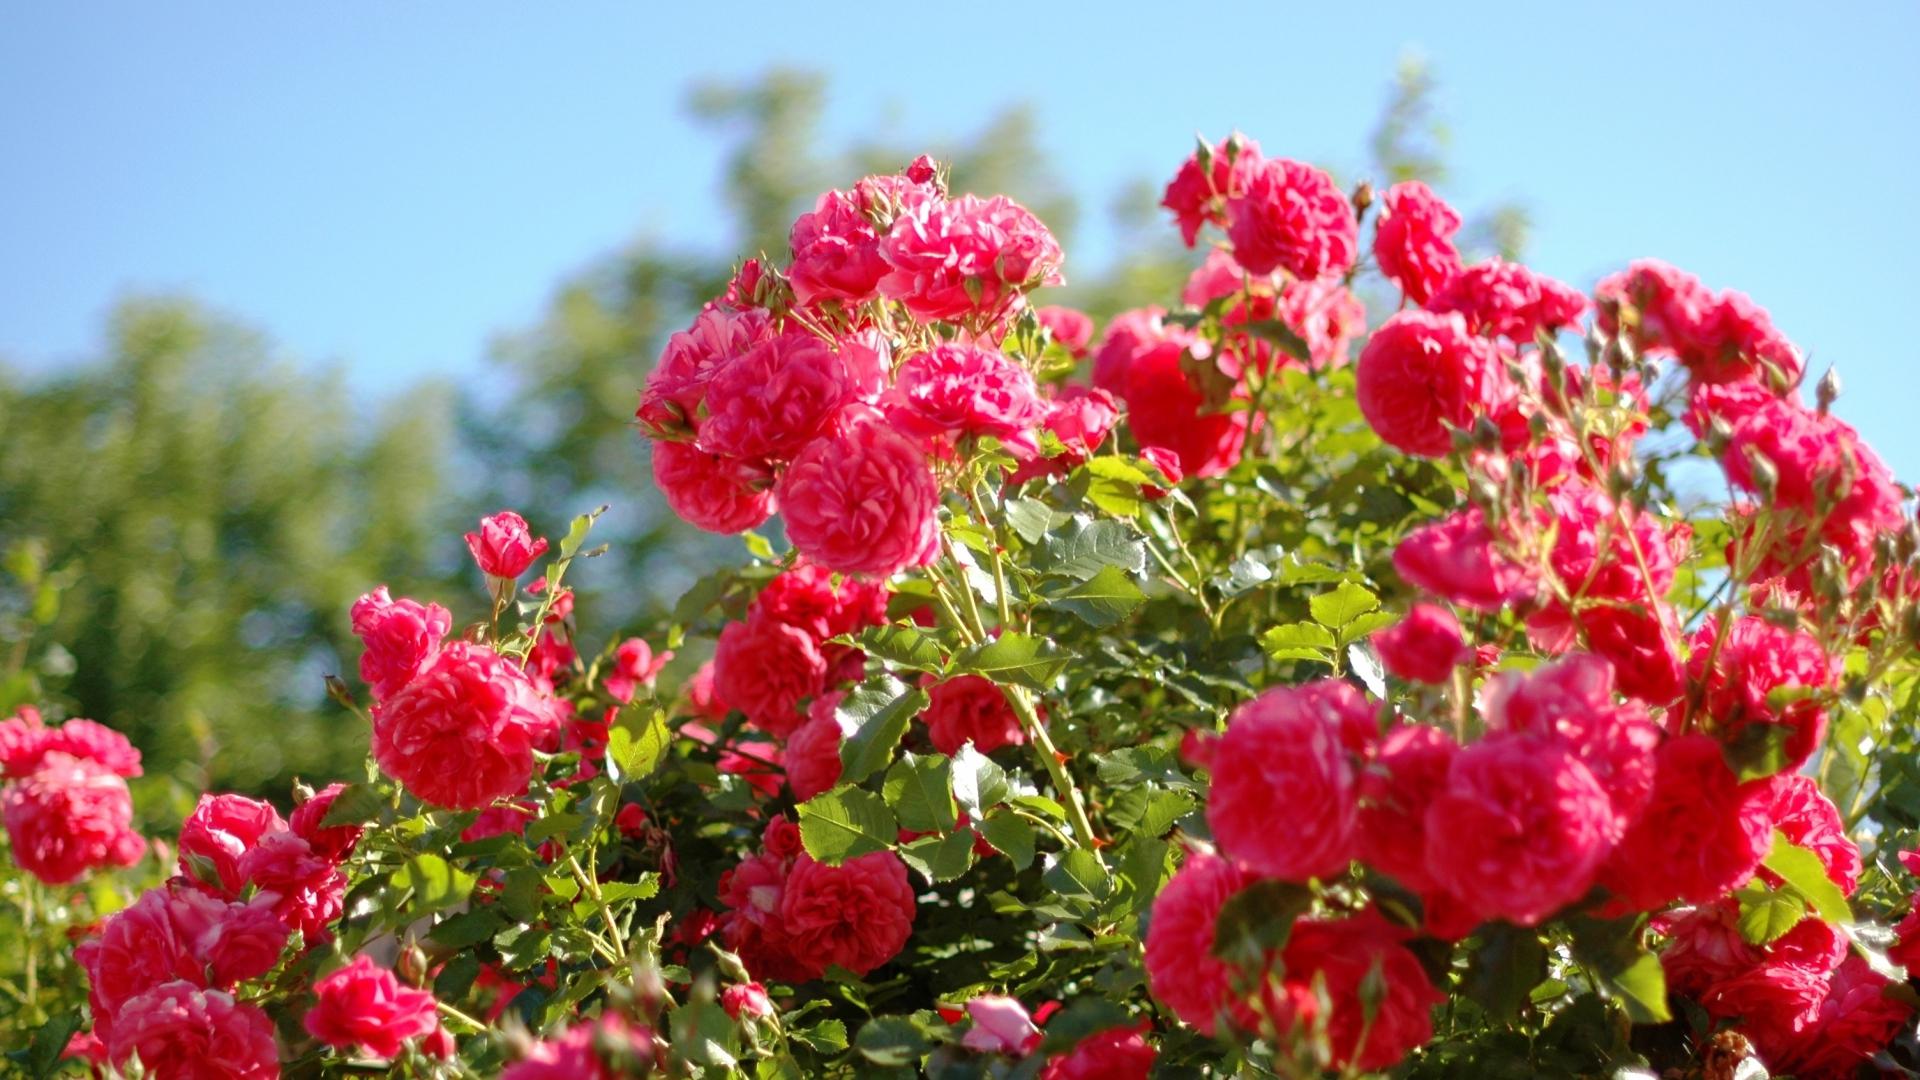 Download Wallpaper 1920x1080 Roses Flowers Shrub Herbs Beauty